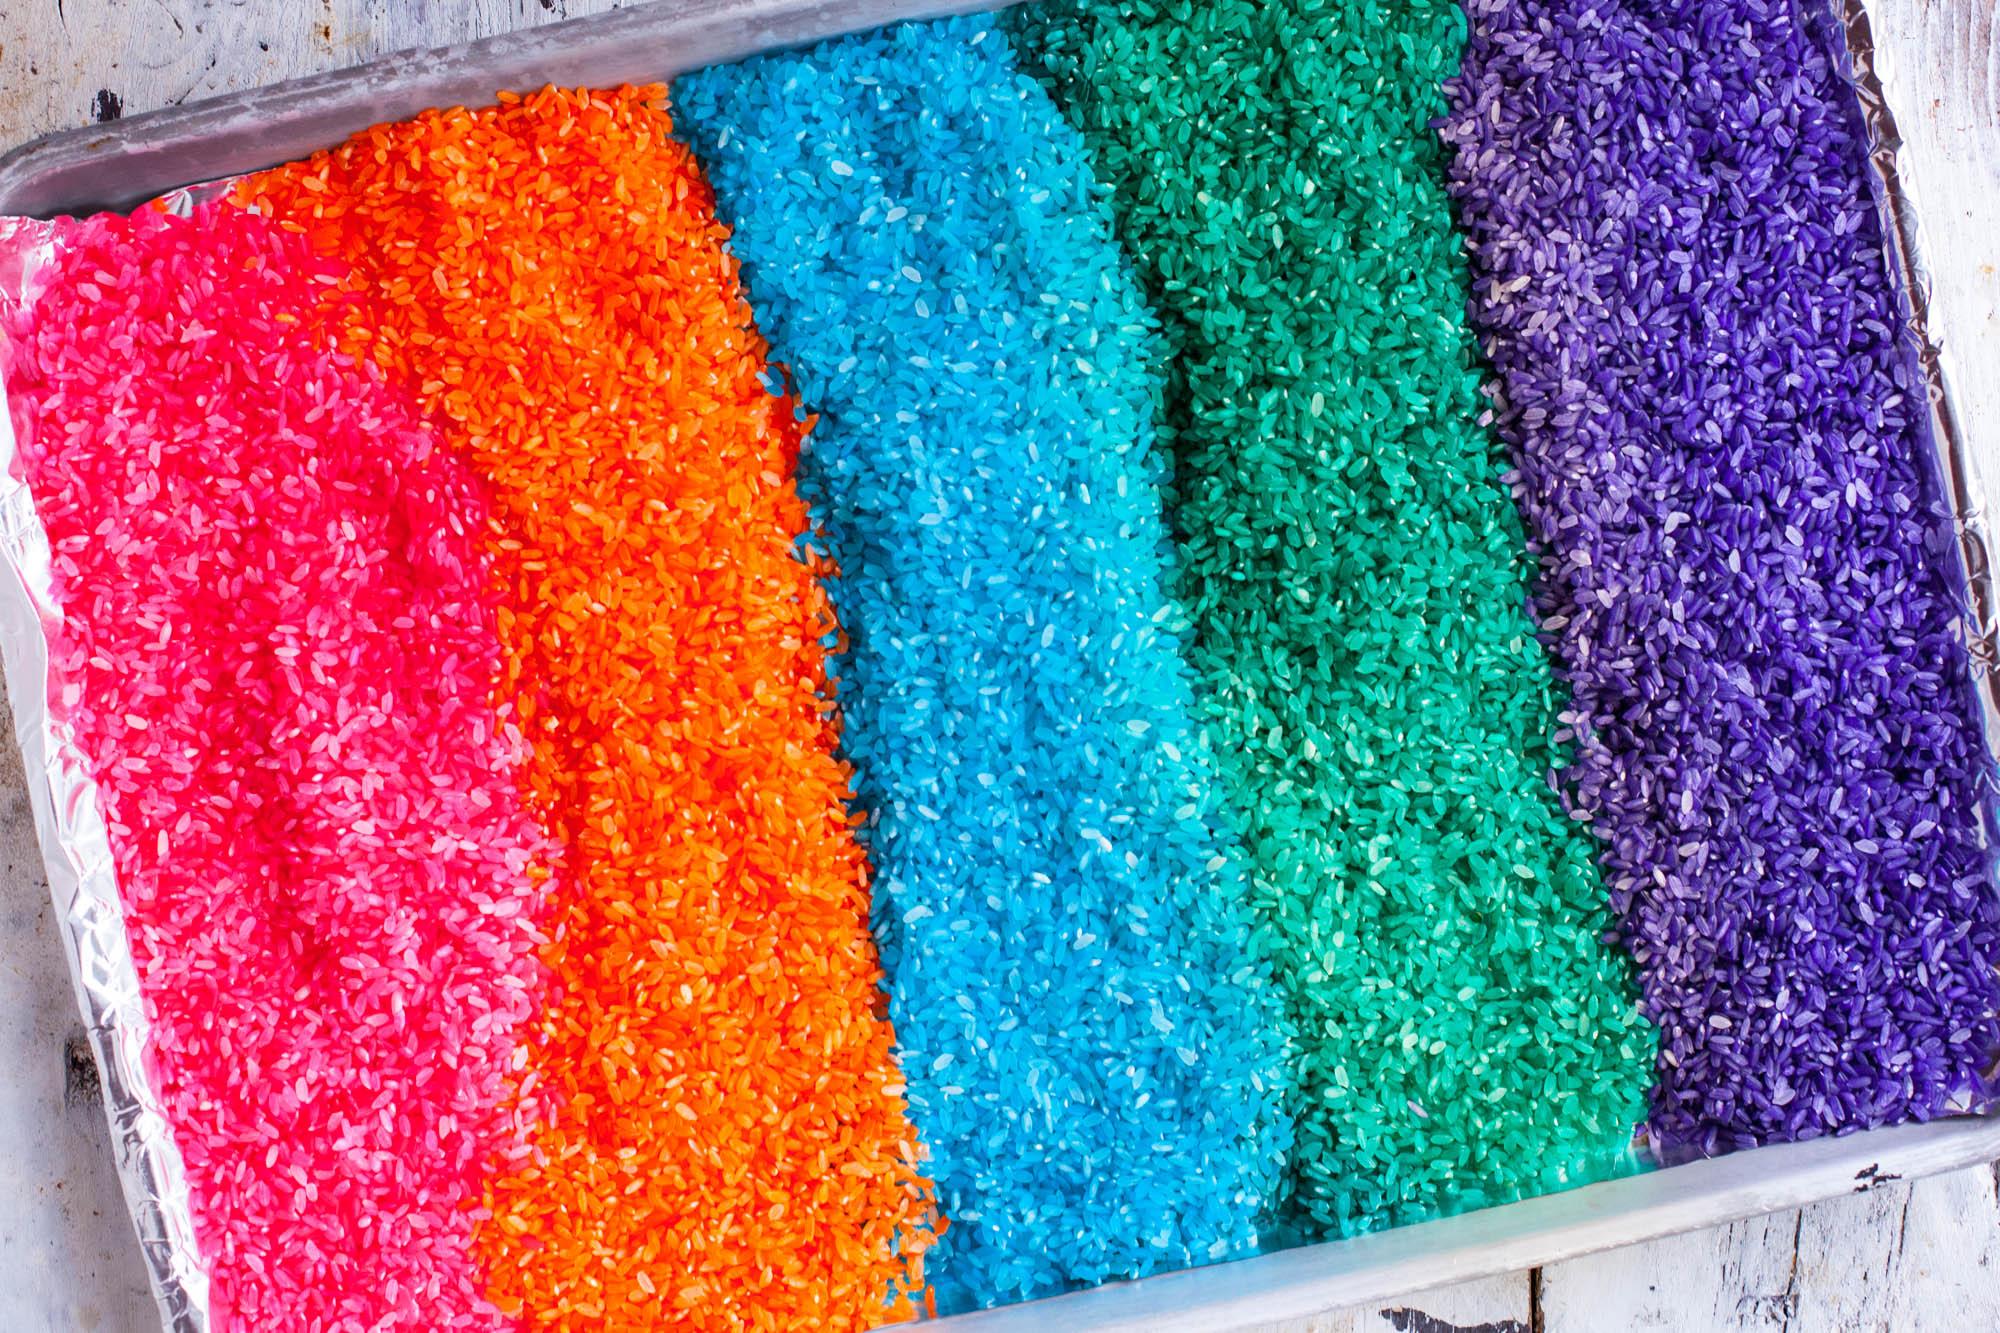 Rainbow Rice Sensory Bin Activity For Kids Eating Richly